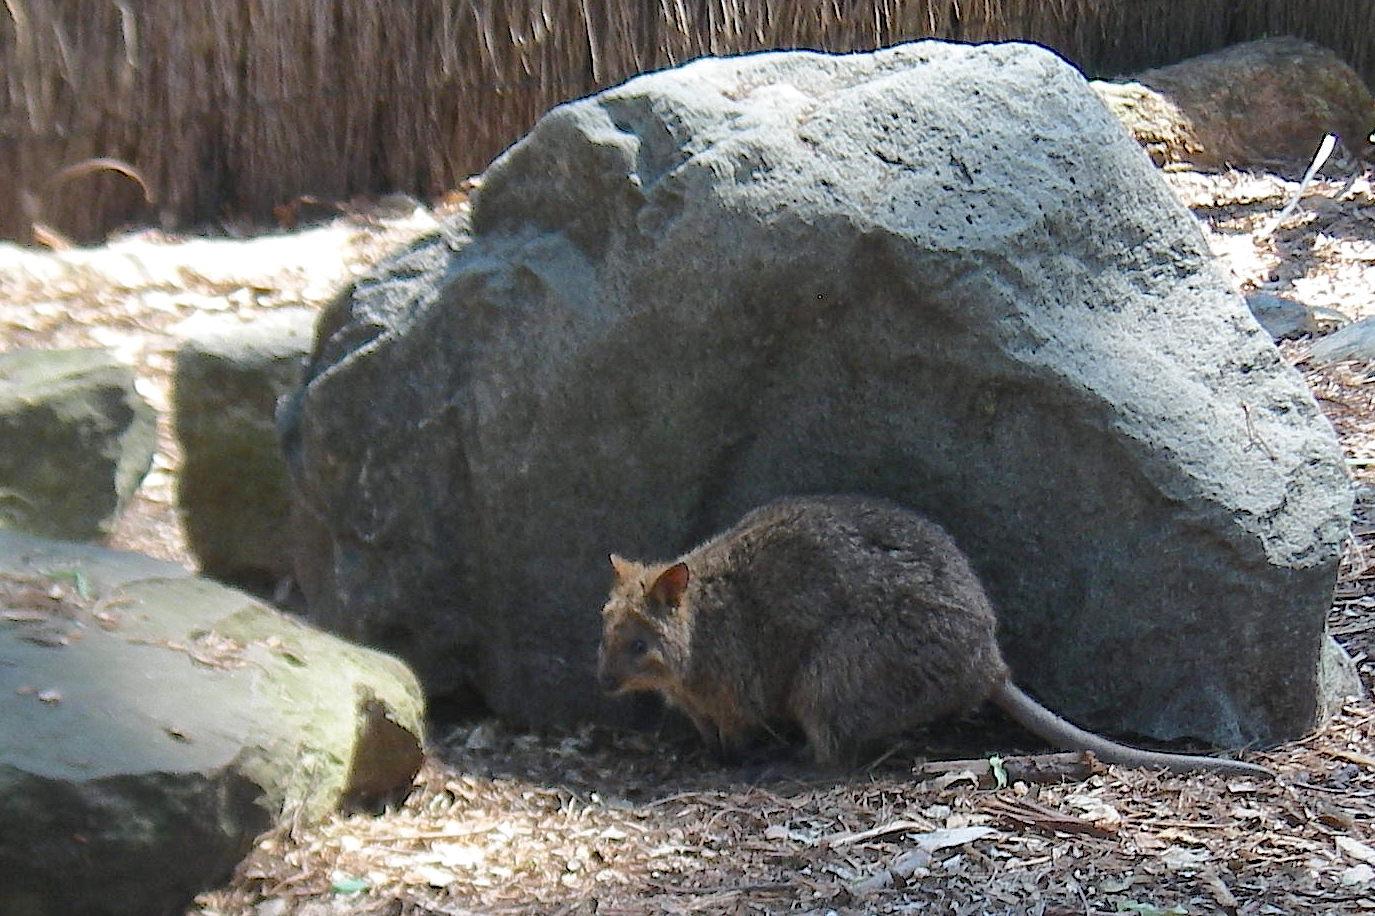 60. A shy potoroo, an Australian marcupial ponders the day